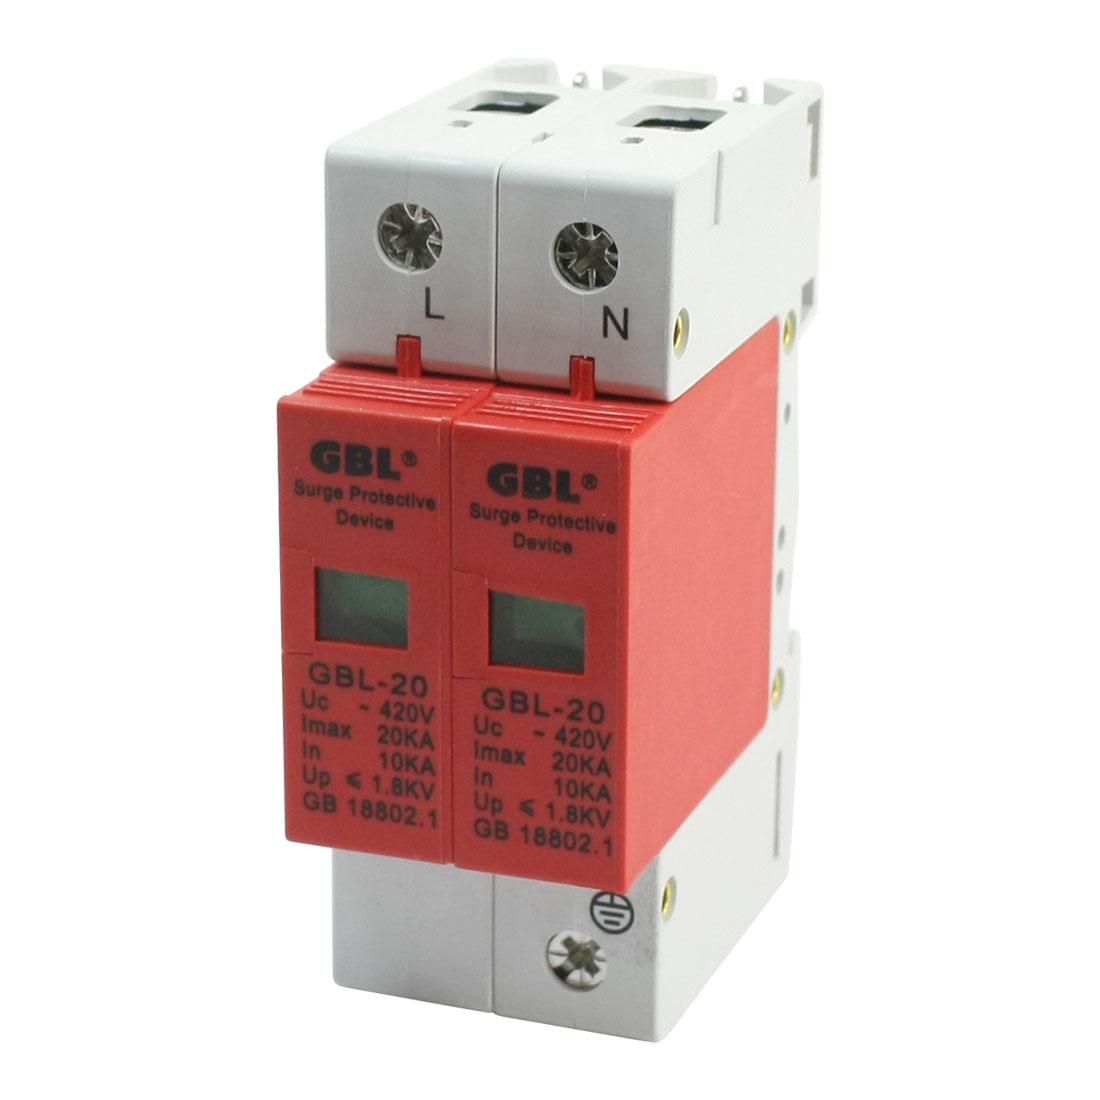 SPD AC 420V 20KA DIN Rail Mount Circuit Breaker Surge Protective Device 2-Poles